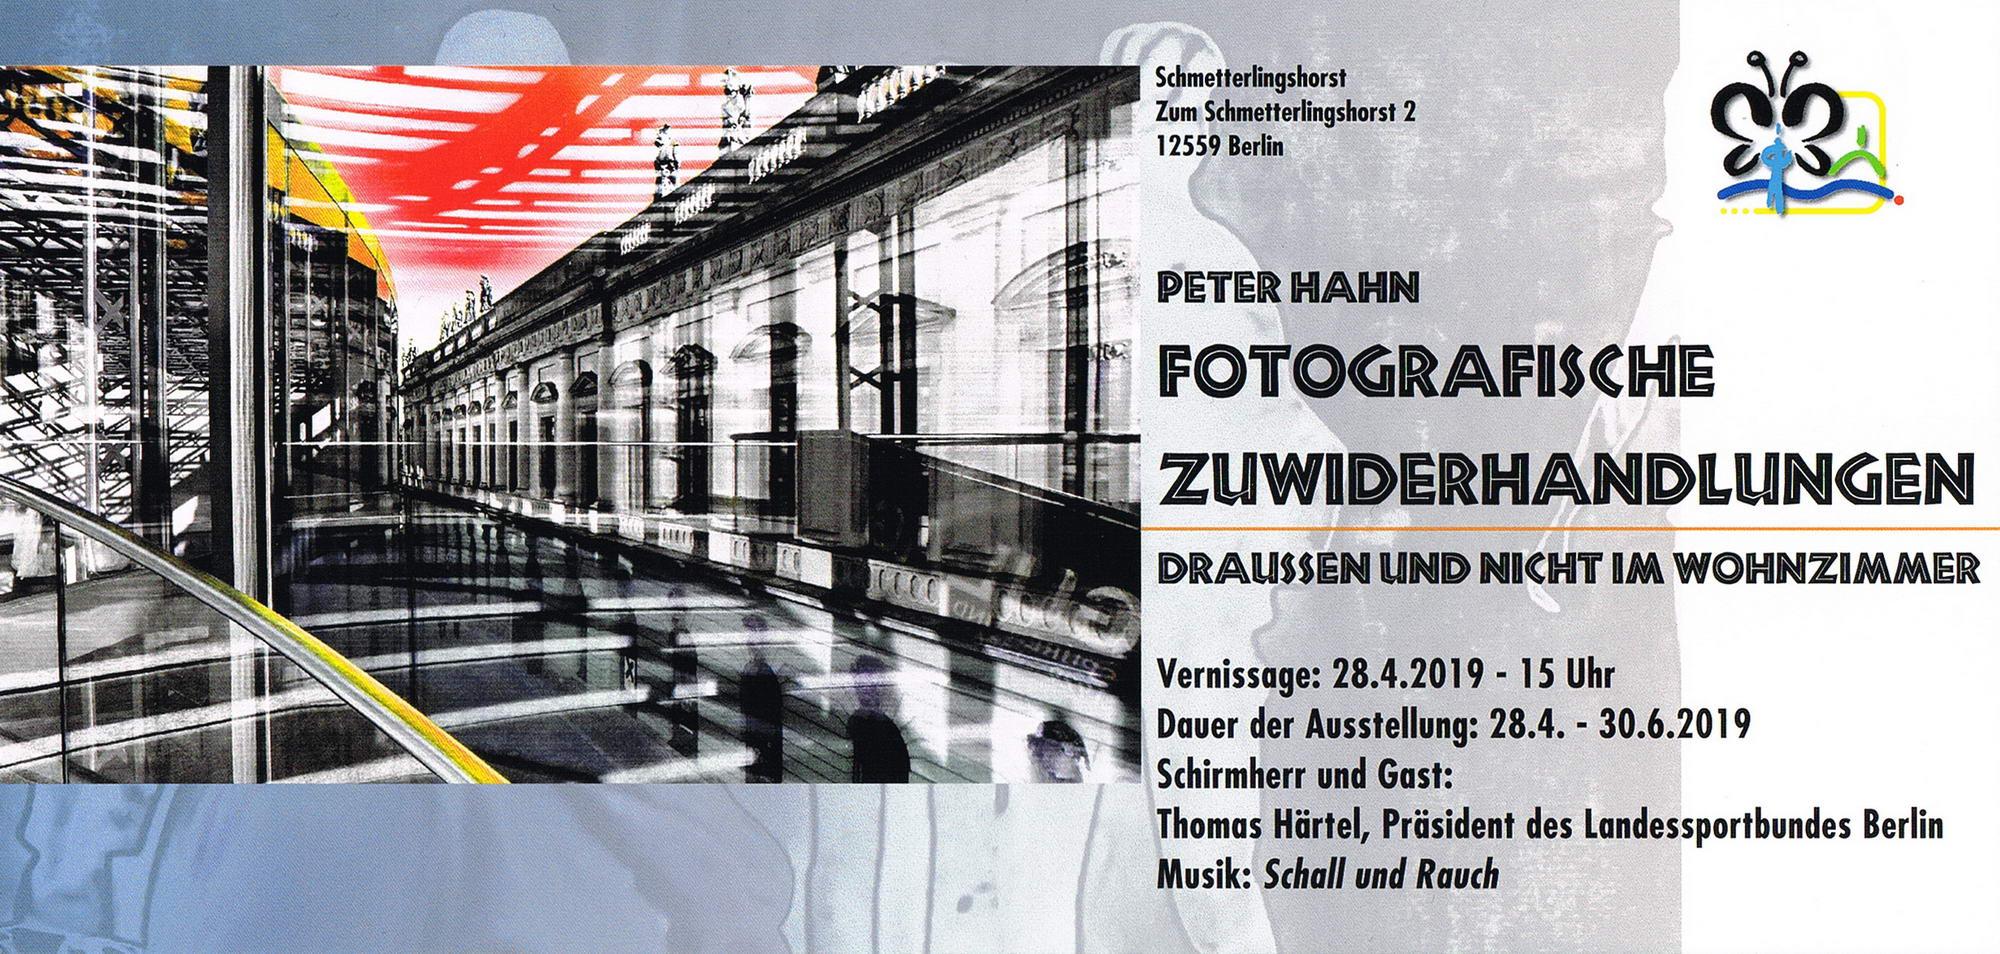 Schmetterlingshorst 2019 Flyer Fotoausstellung Peter Hahn 01 konv